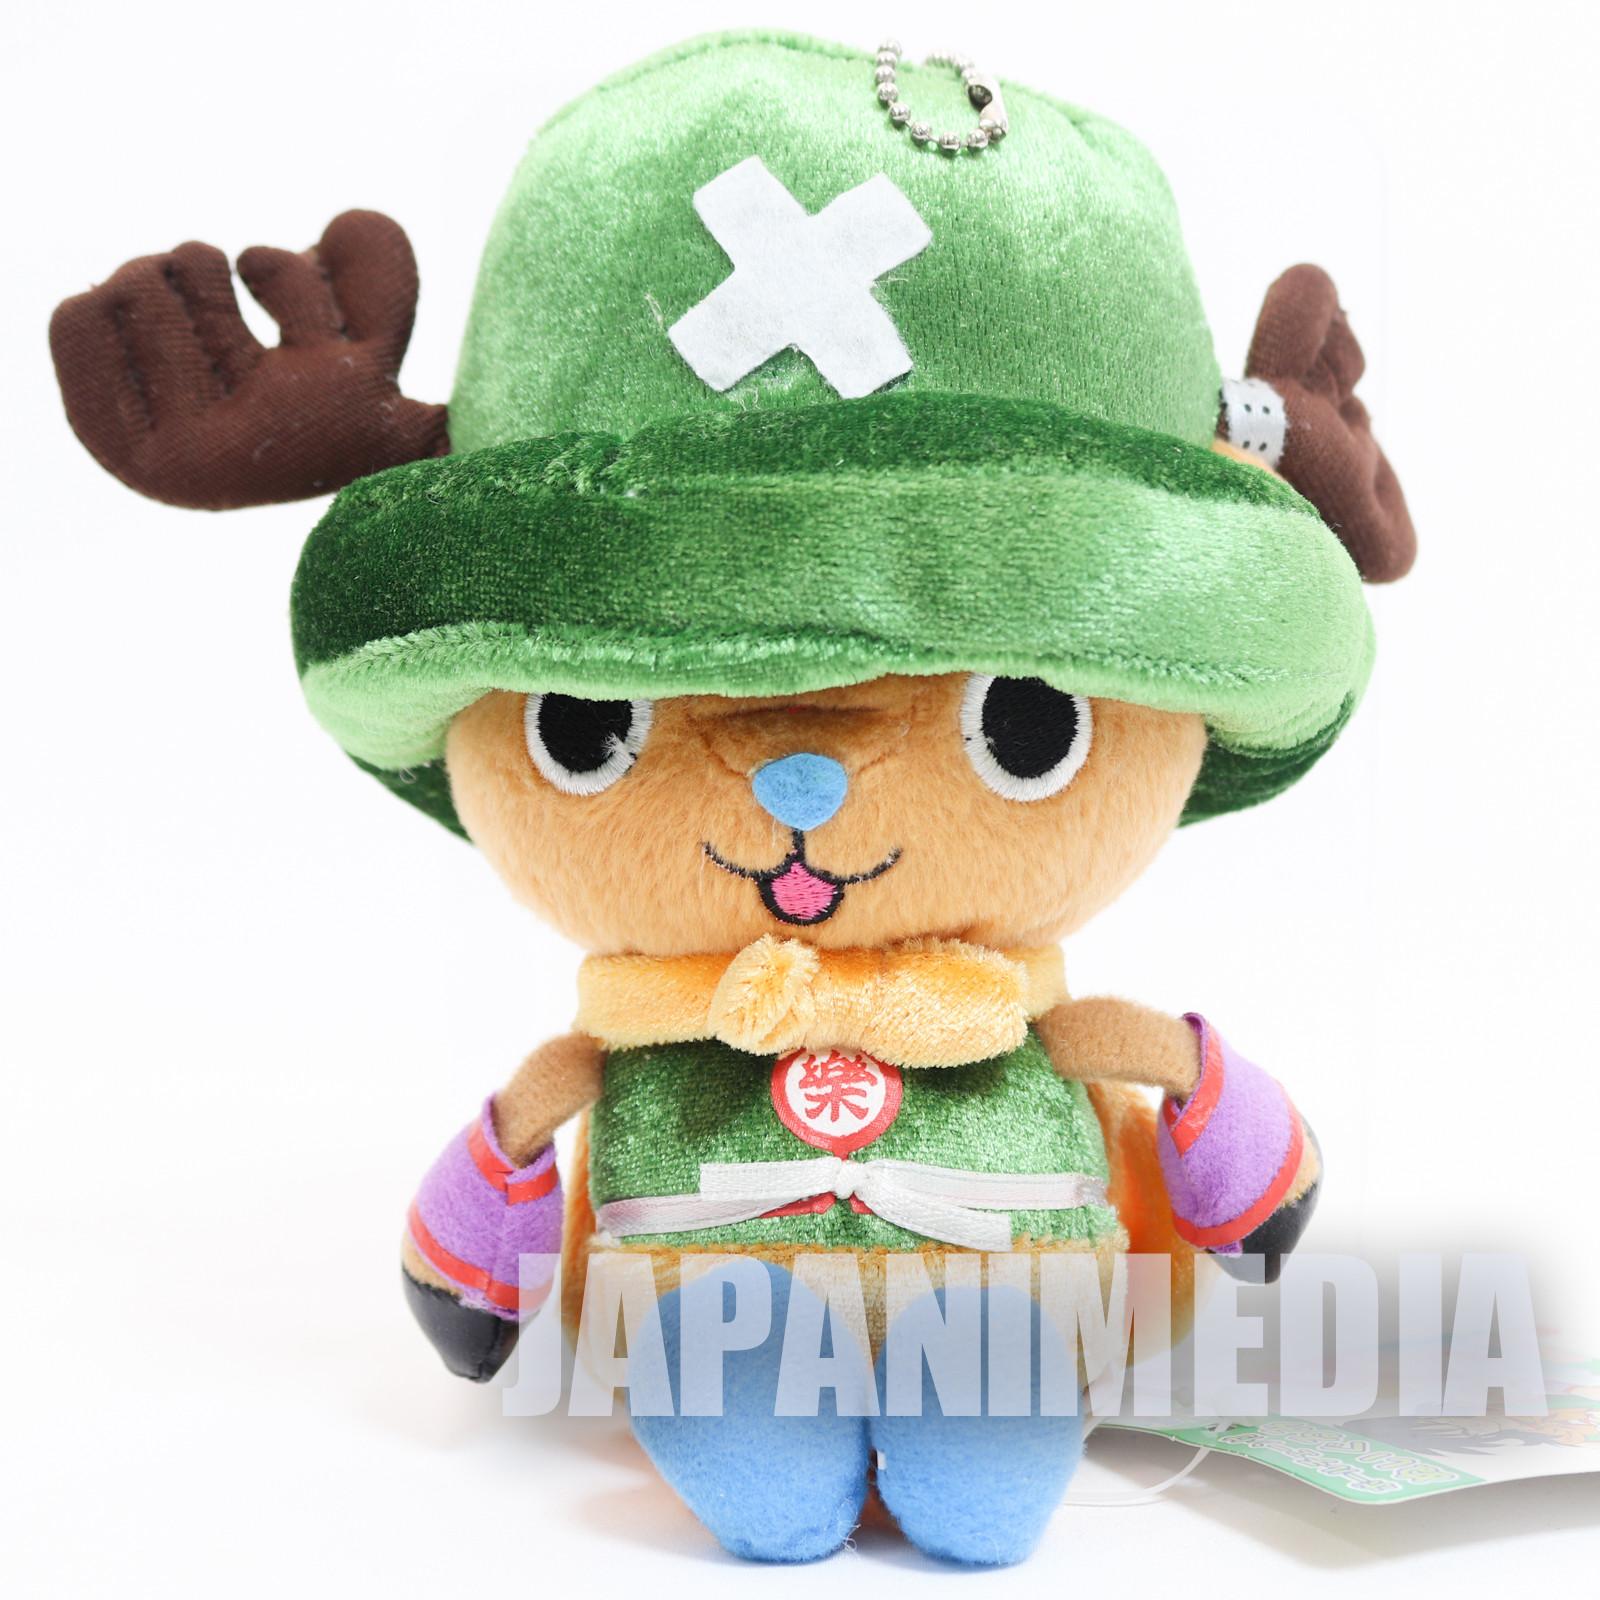 Dragon Ball Z x ONE PIECE Chopper Man x Yamcha Plush Doll JAPAN ANIME